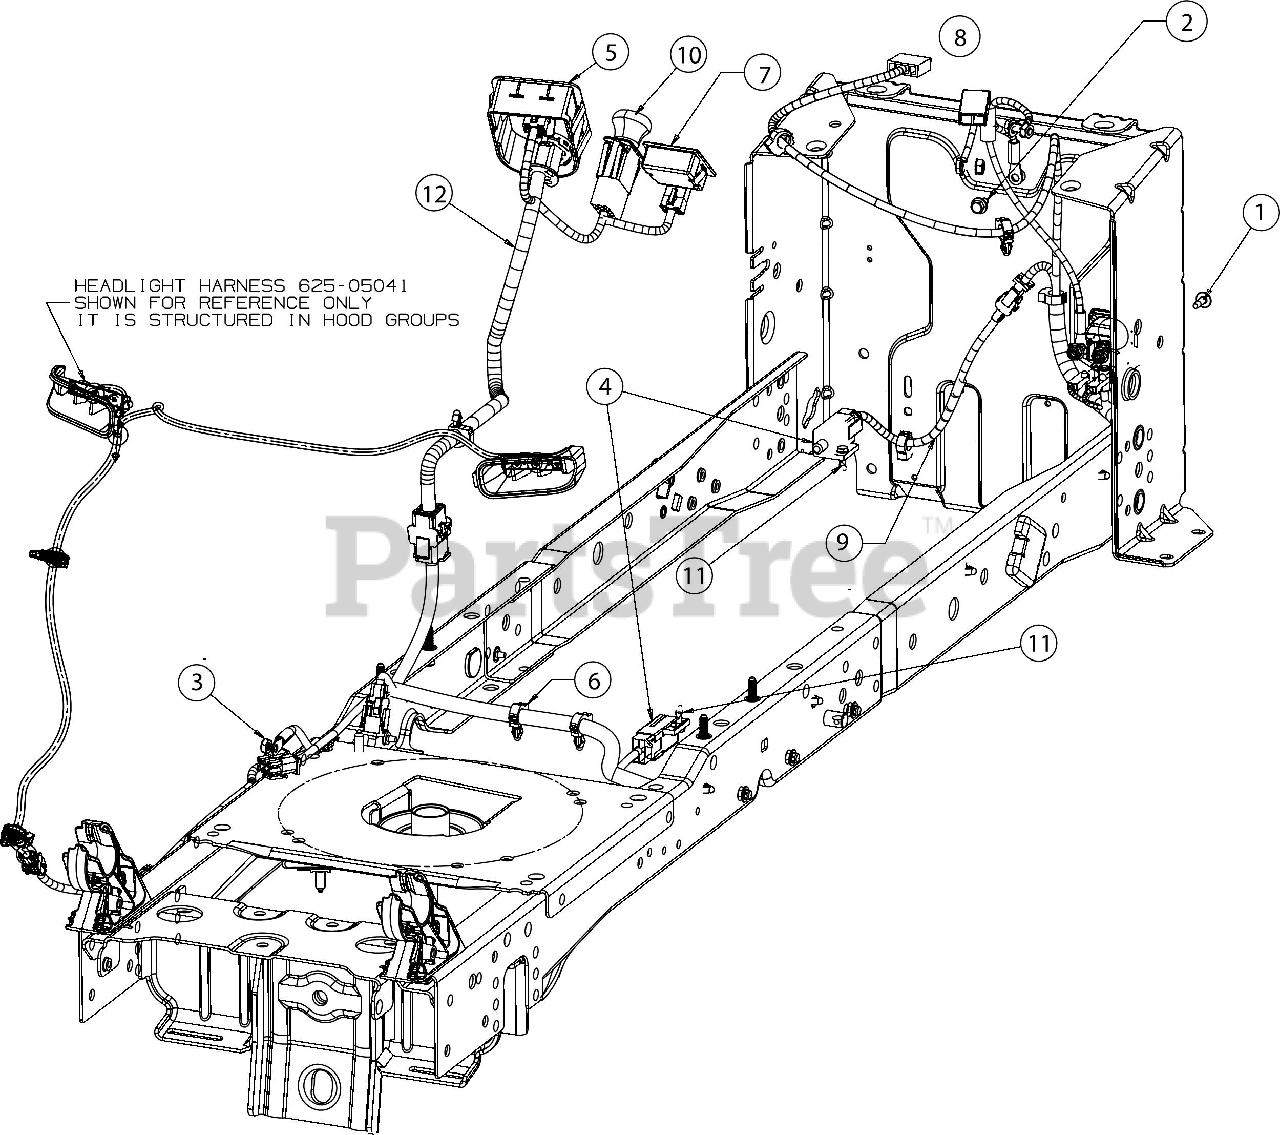 Craftsman 247 13aqa1zt099